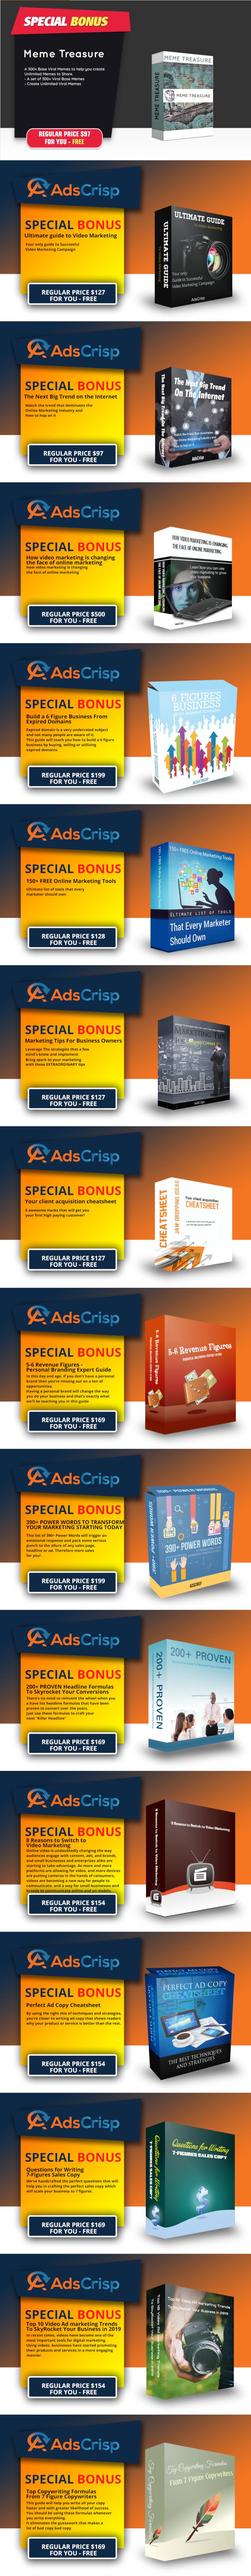 AdsCrisp Bonuses